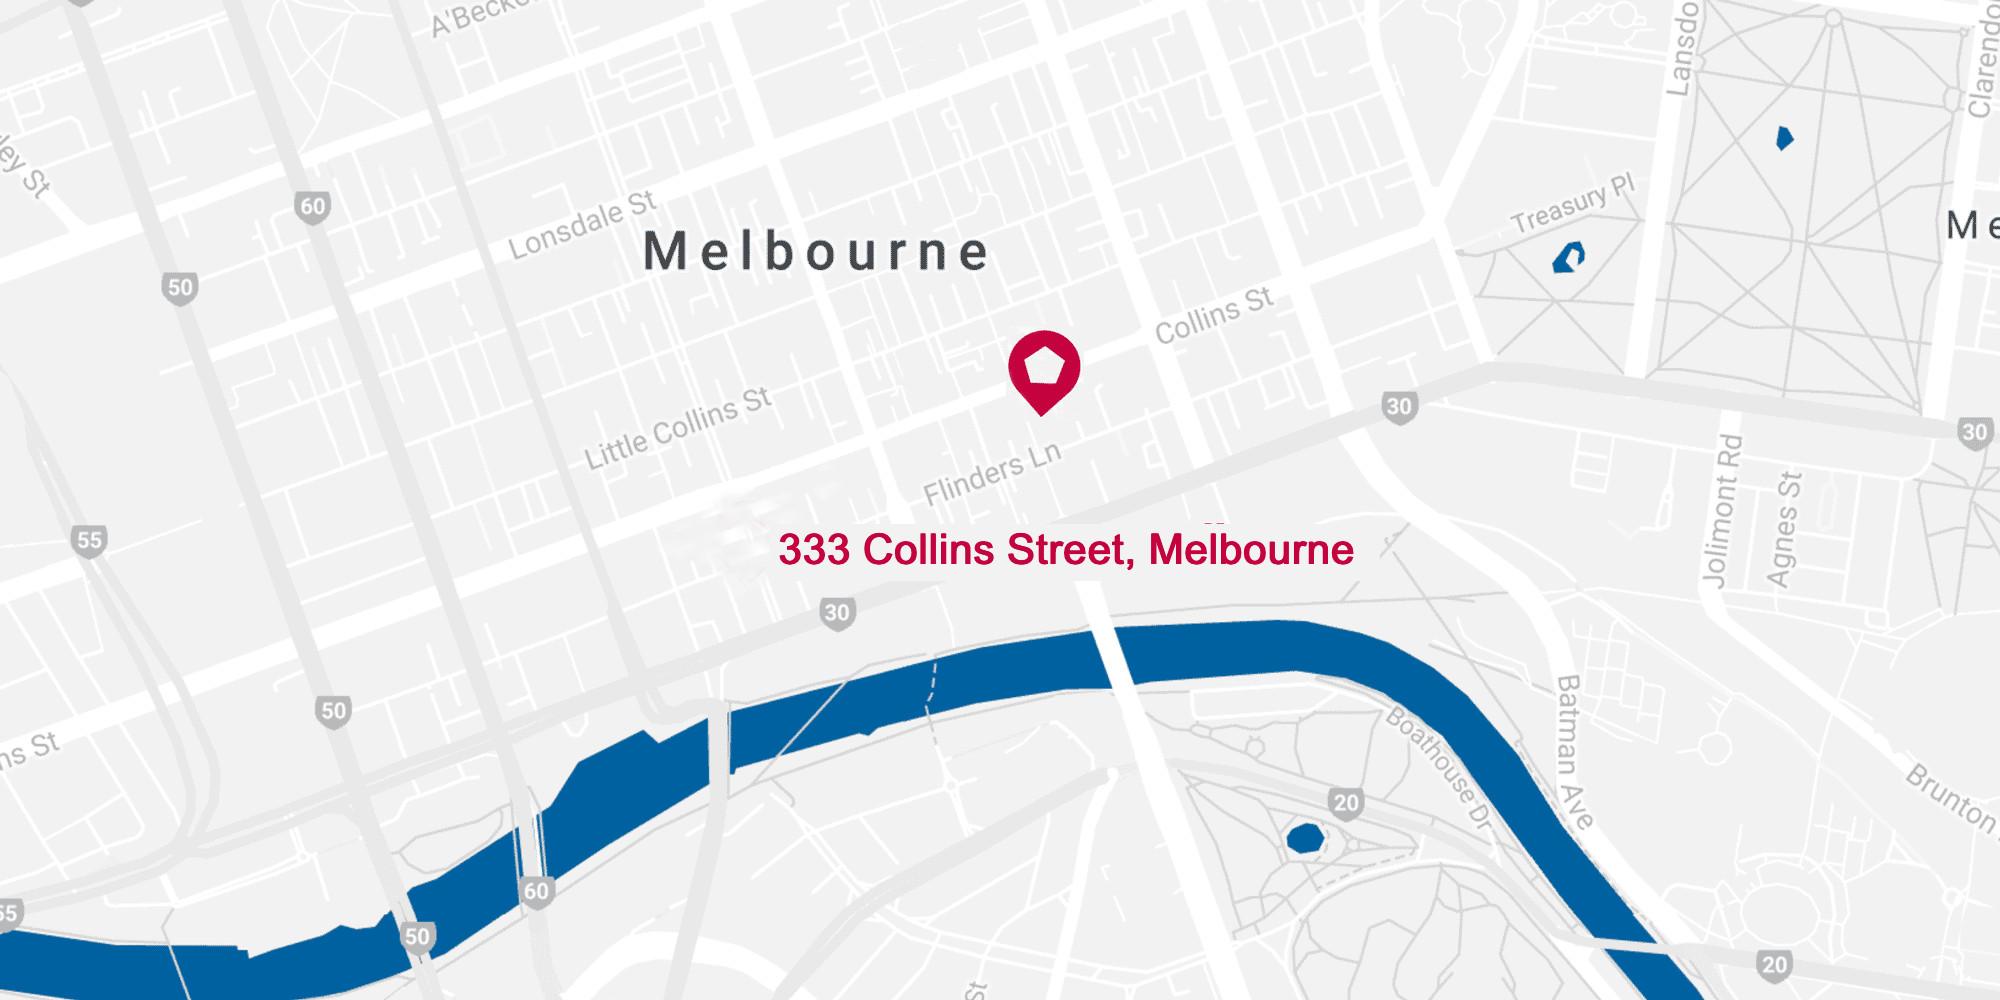 333 Collins Street, Melbourne